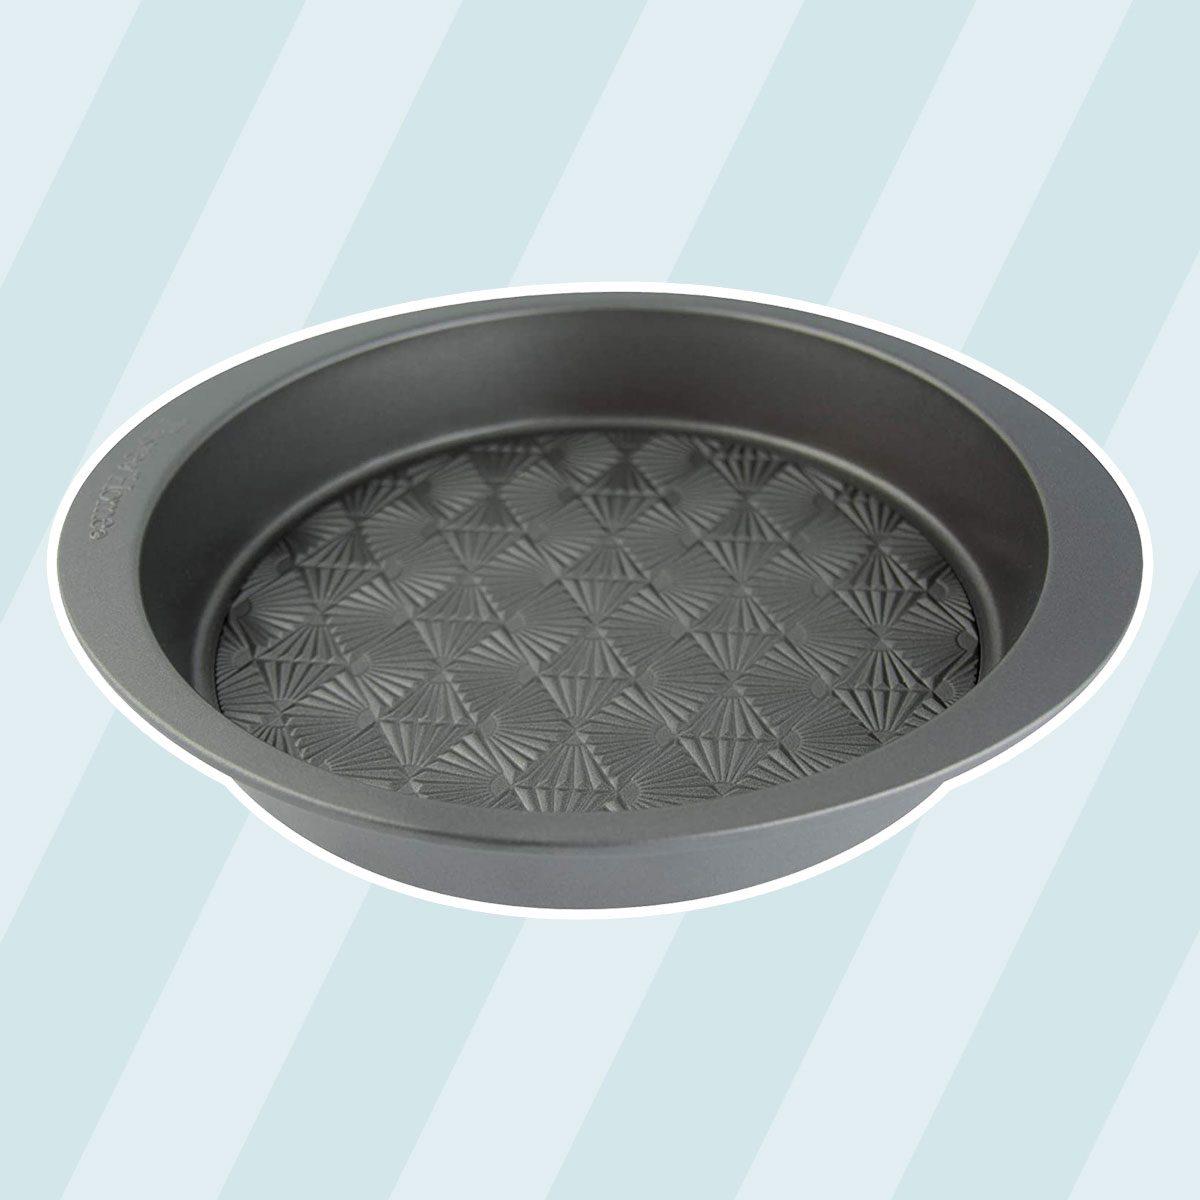 Taste of Home 9-inch Non-Stick Metal Round Baking Pan